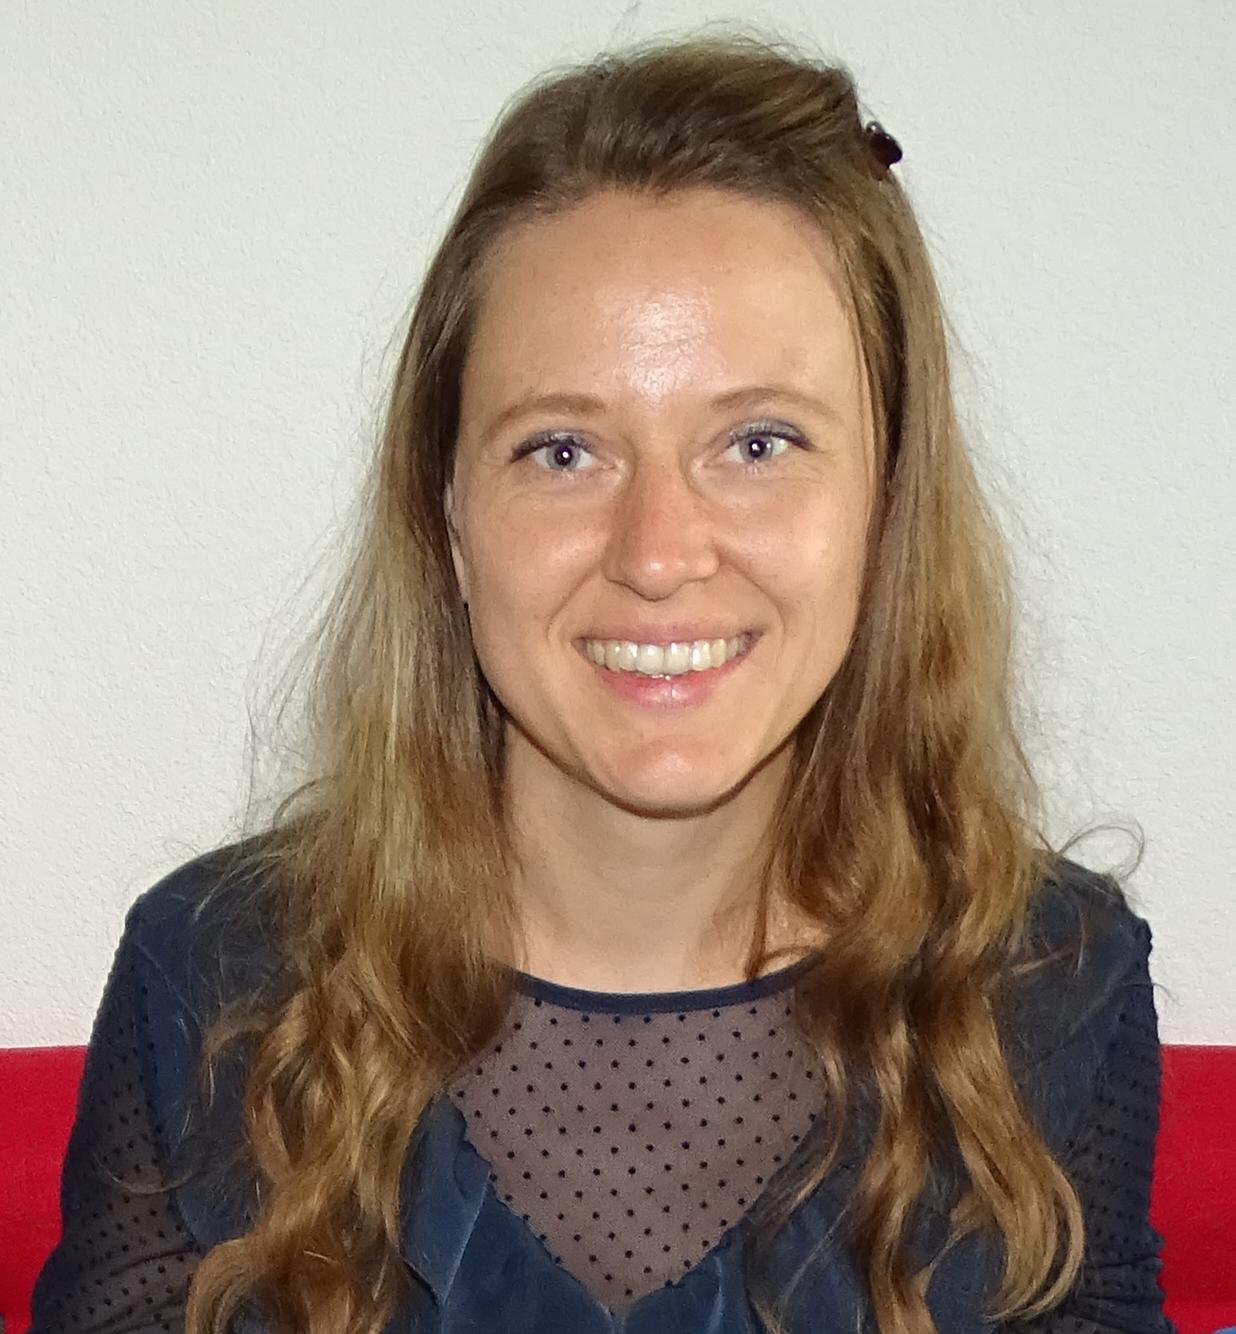 Emily Solcova